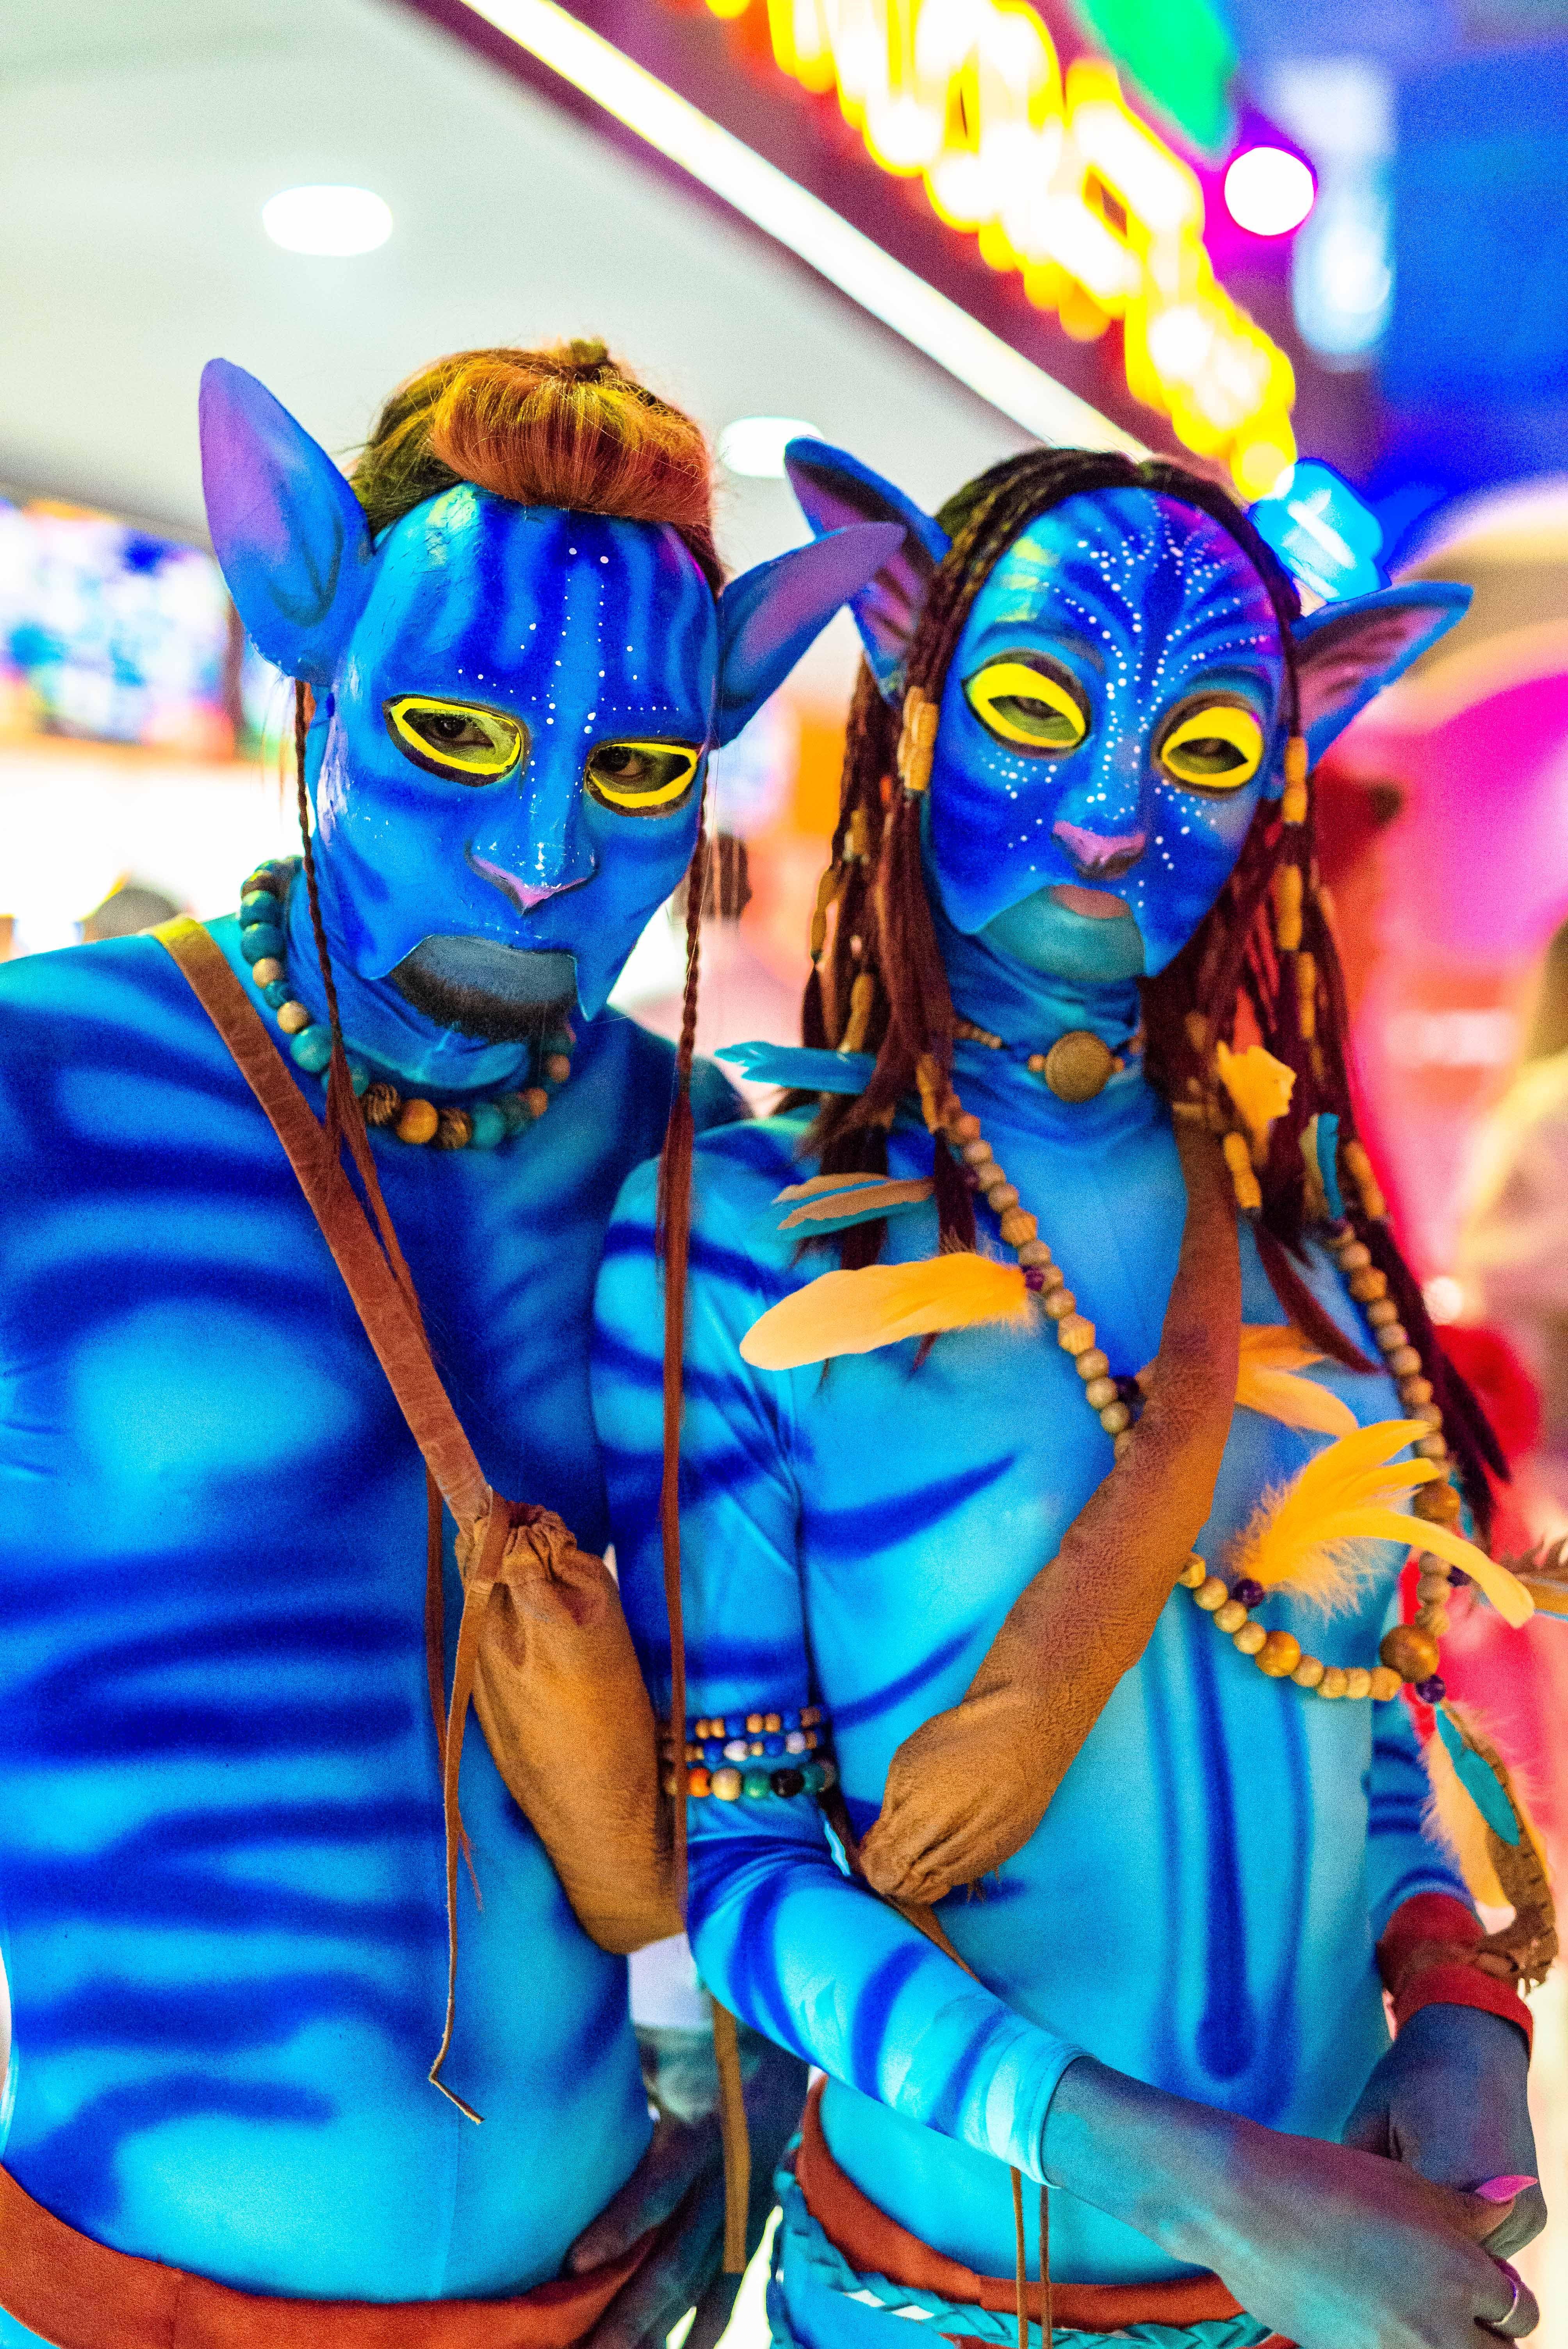 Avatar Theory: The Navi Are Not Native To Pandora